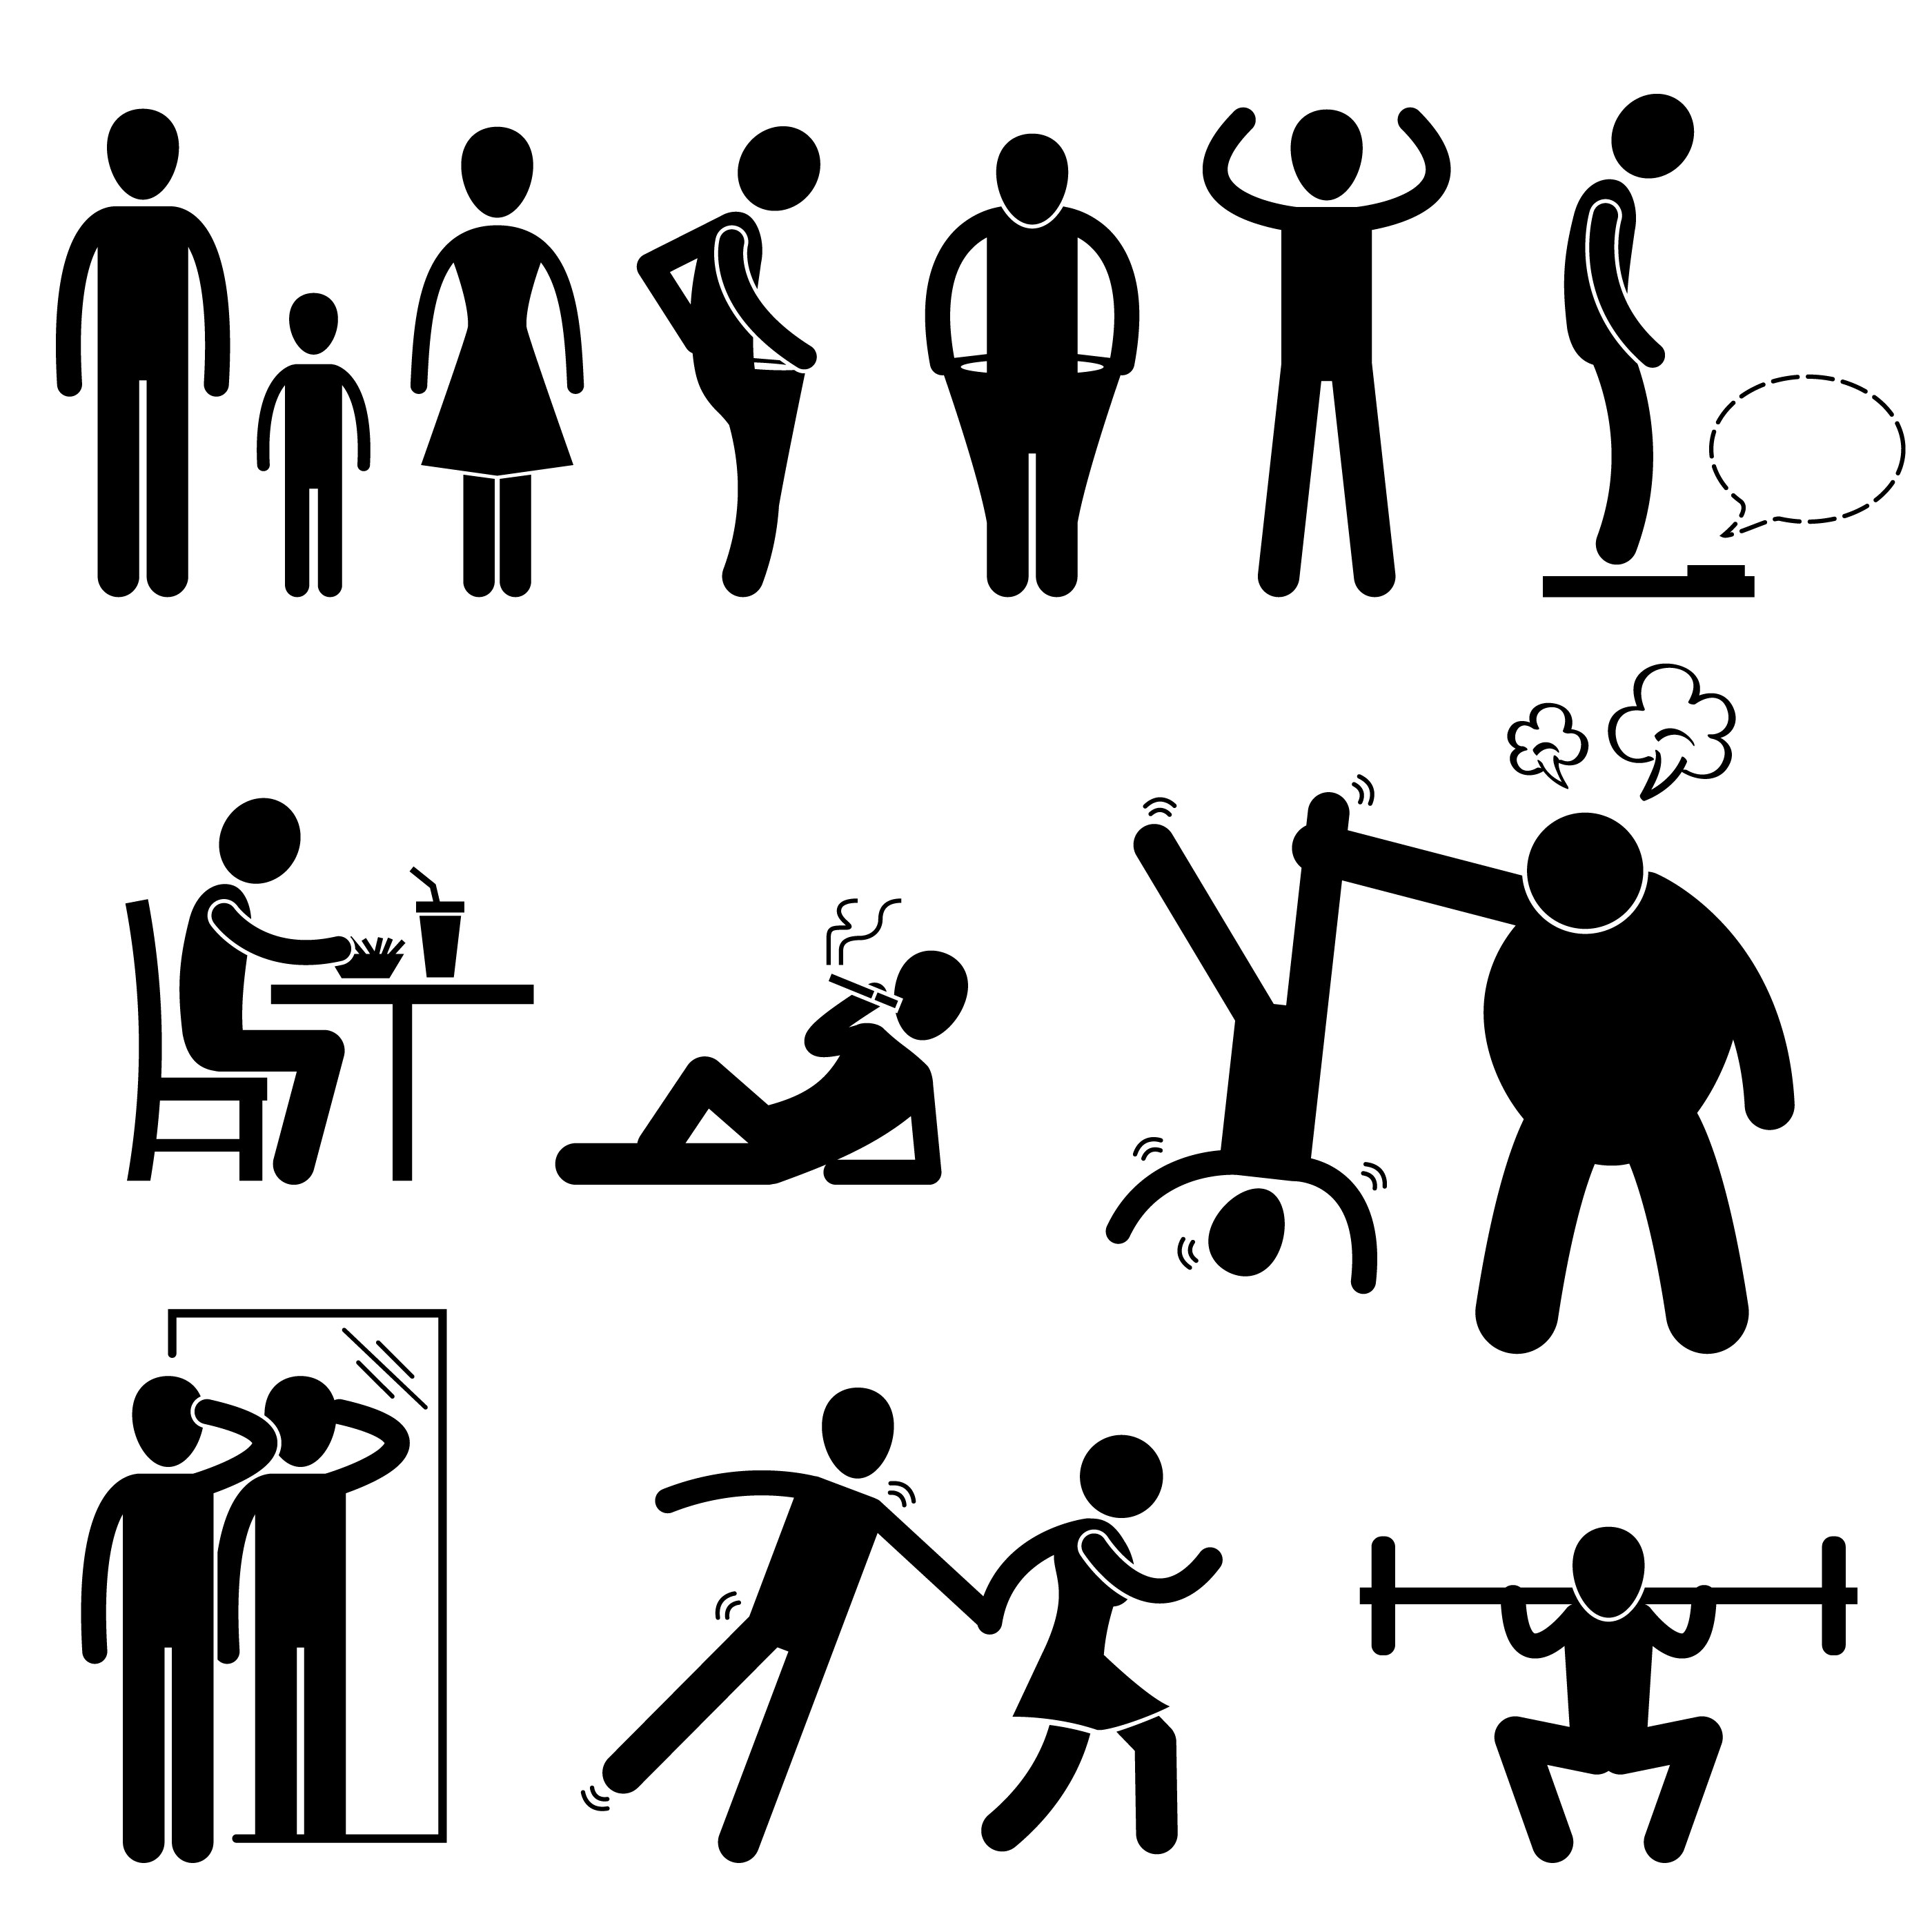 Thin Slim Skinny Weak Man Stick Figure Pictogram Icon